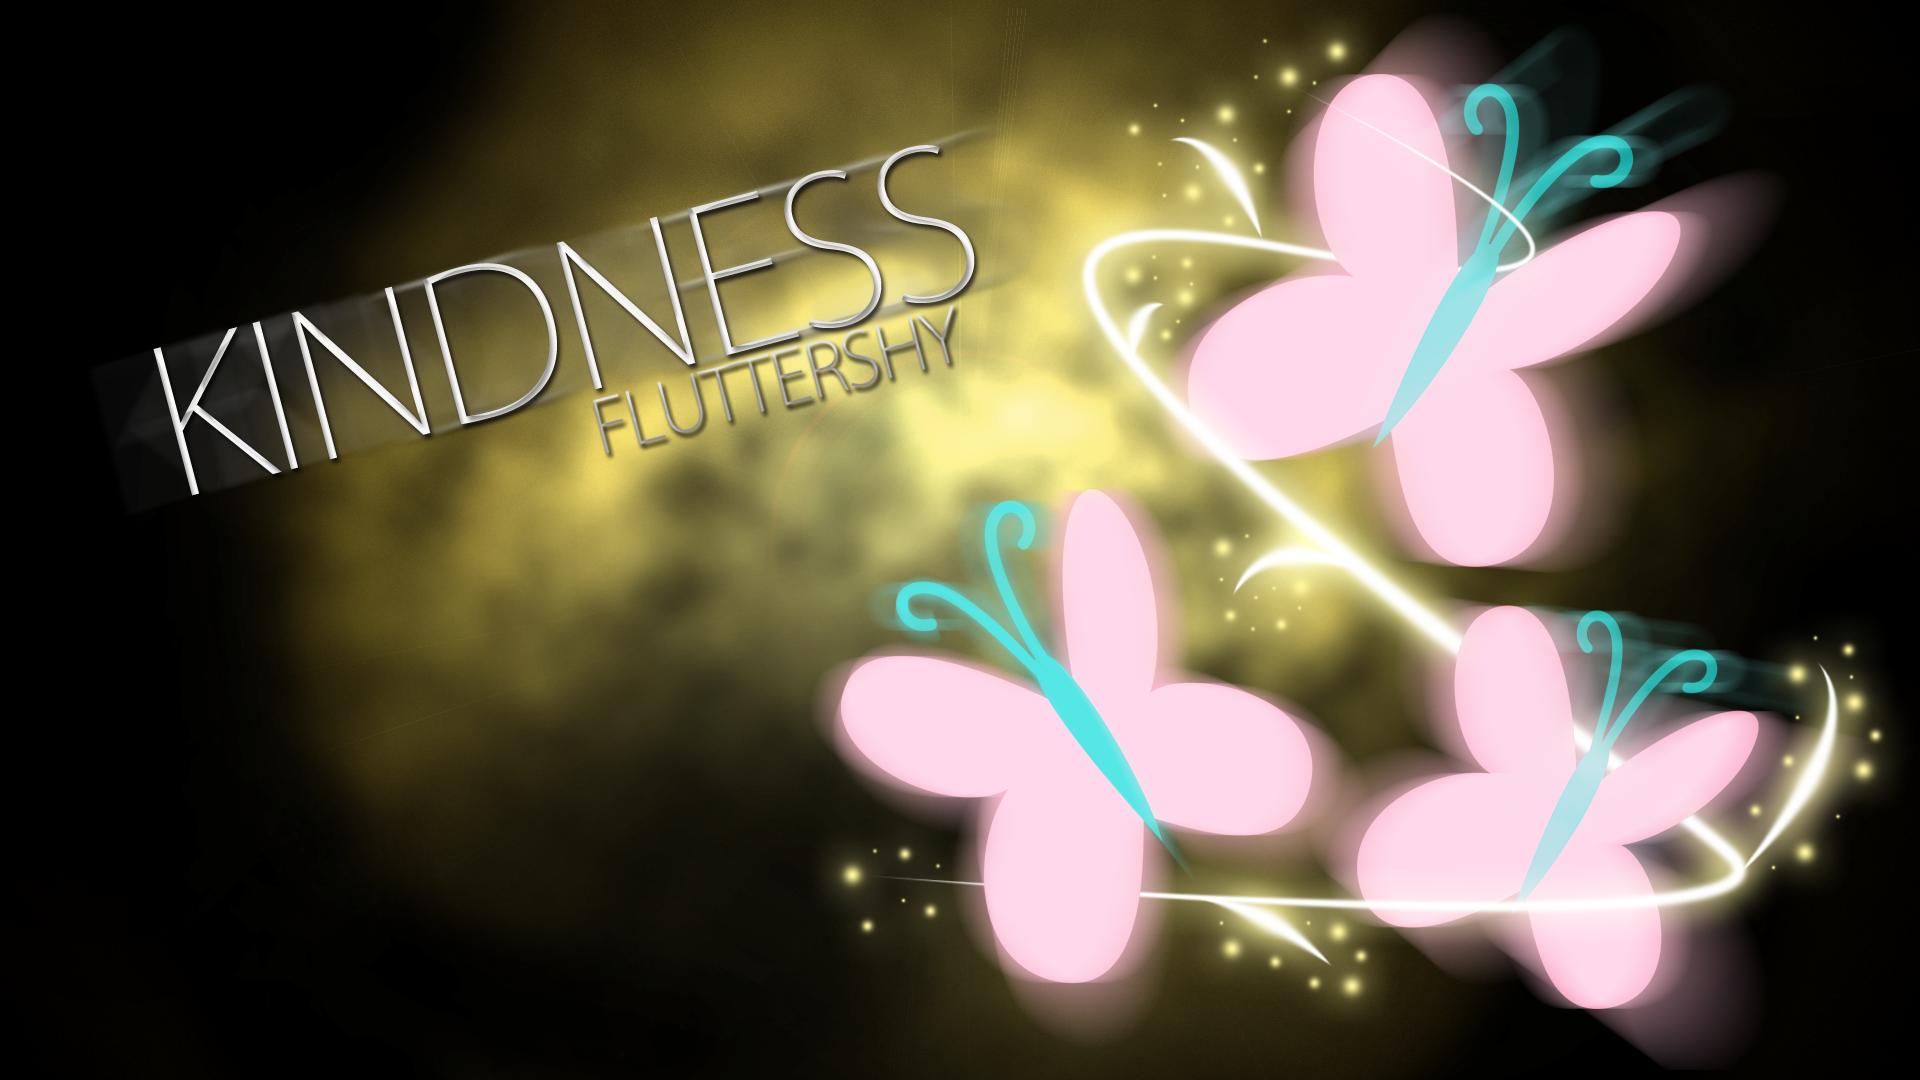 Fluttershy Kindness Cutie Mark Wallpaper by BlueDragonHans